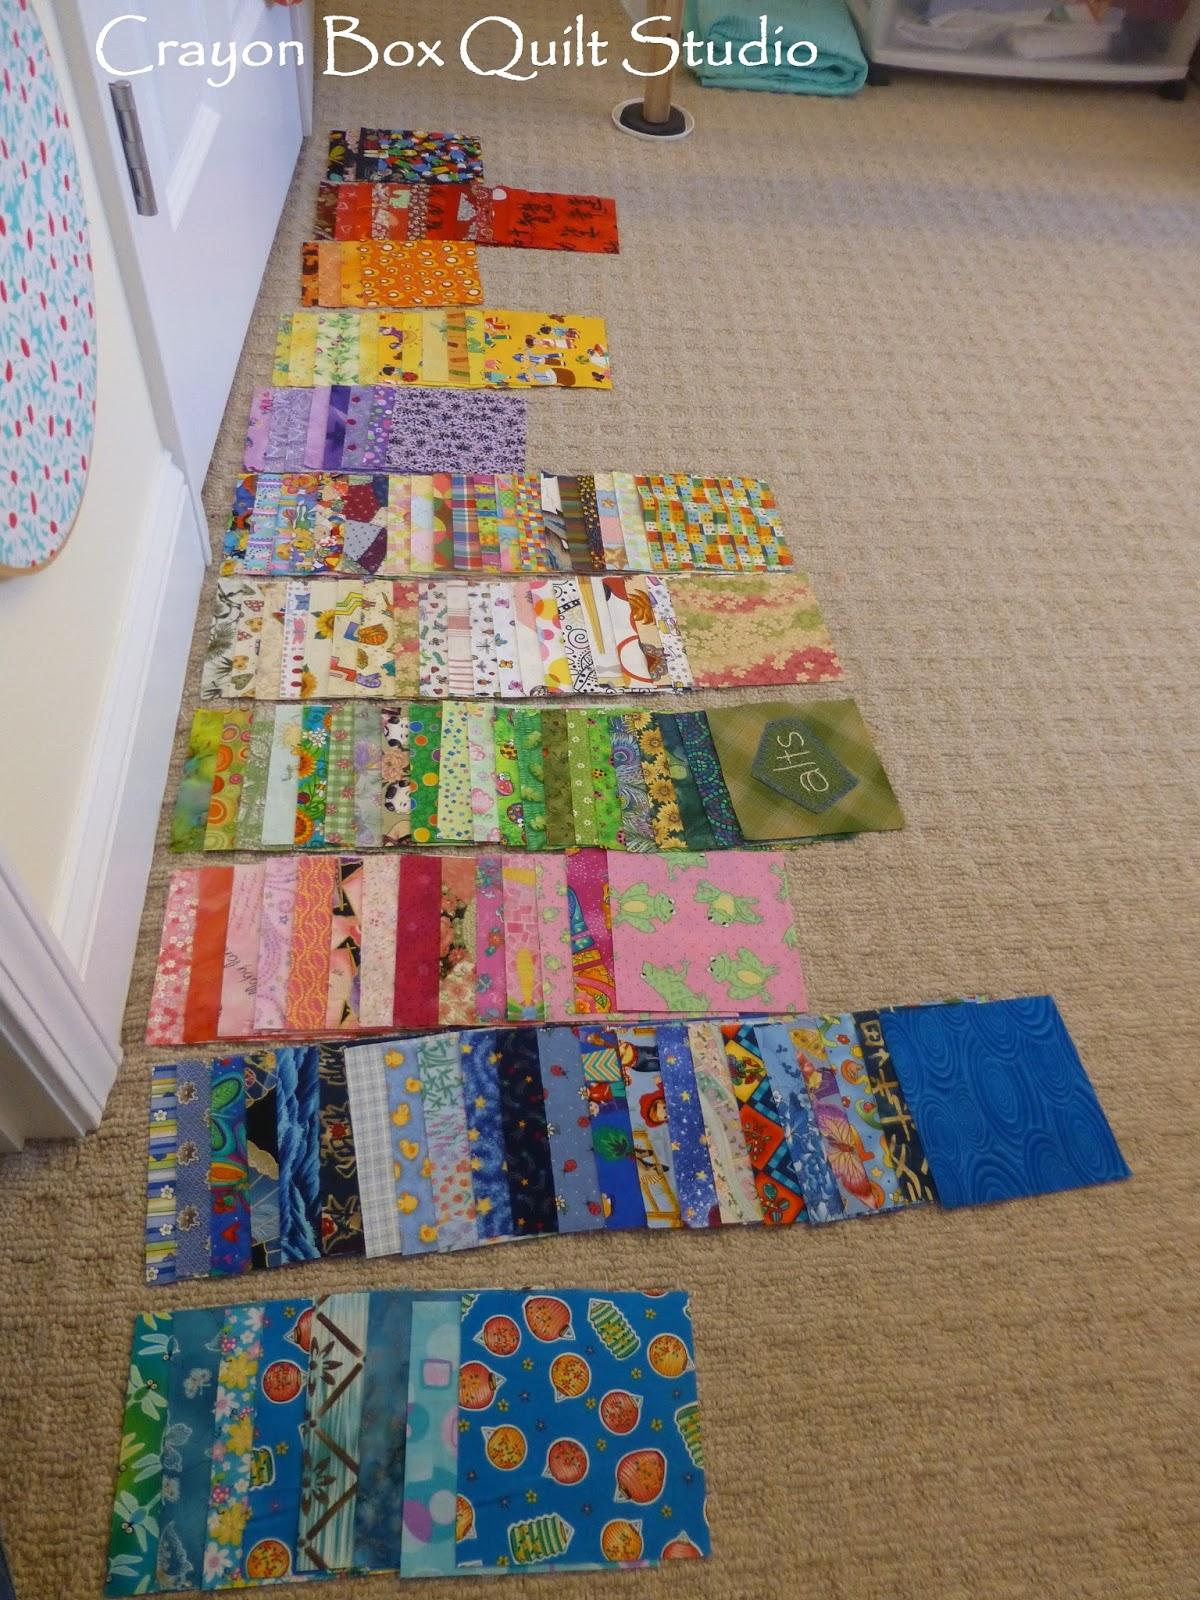 Crayon Box Quilt Studio: Alex's 100 Good Wishes Quilt - A finish